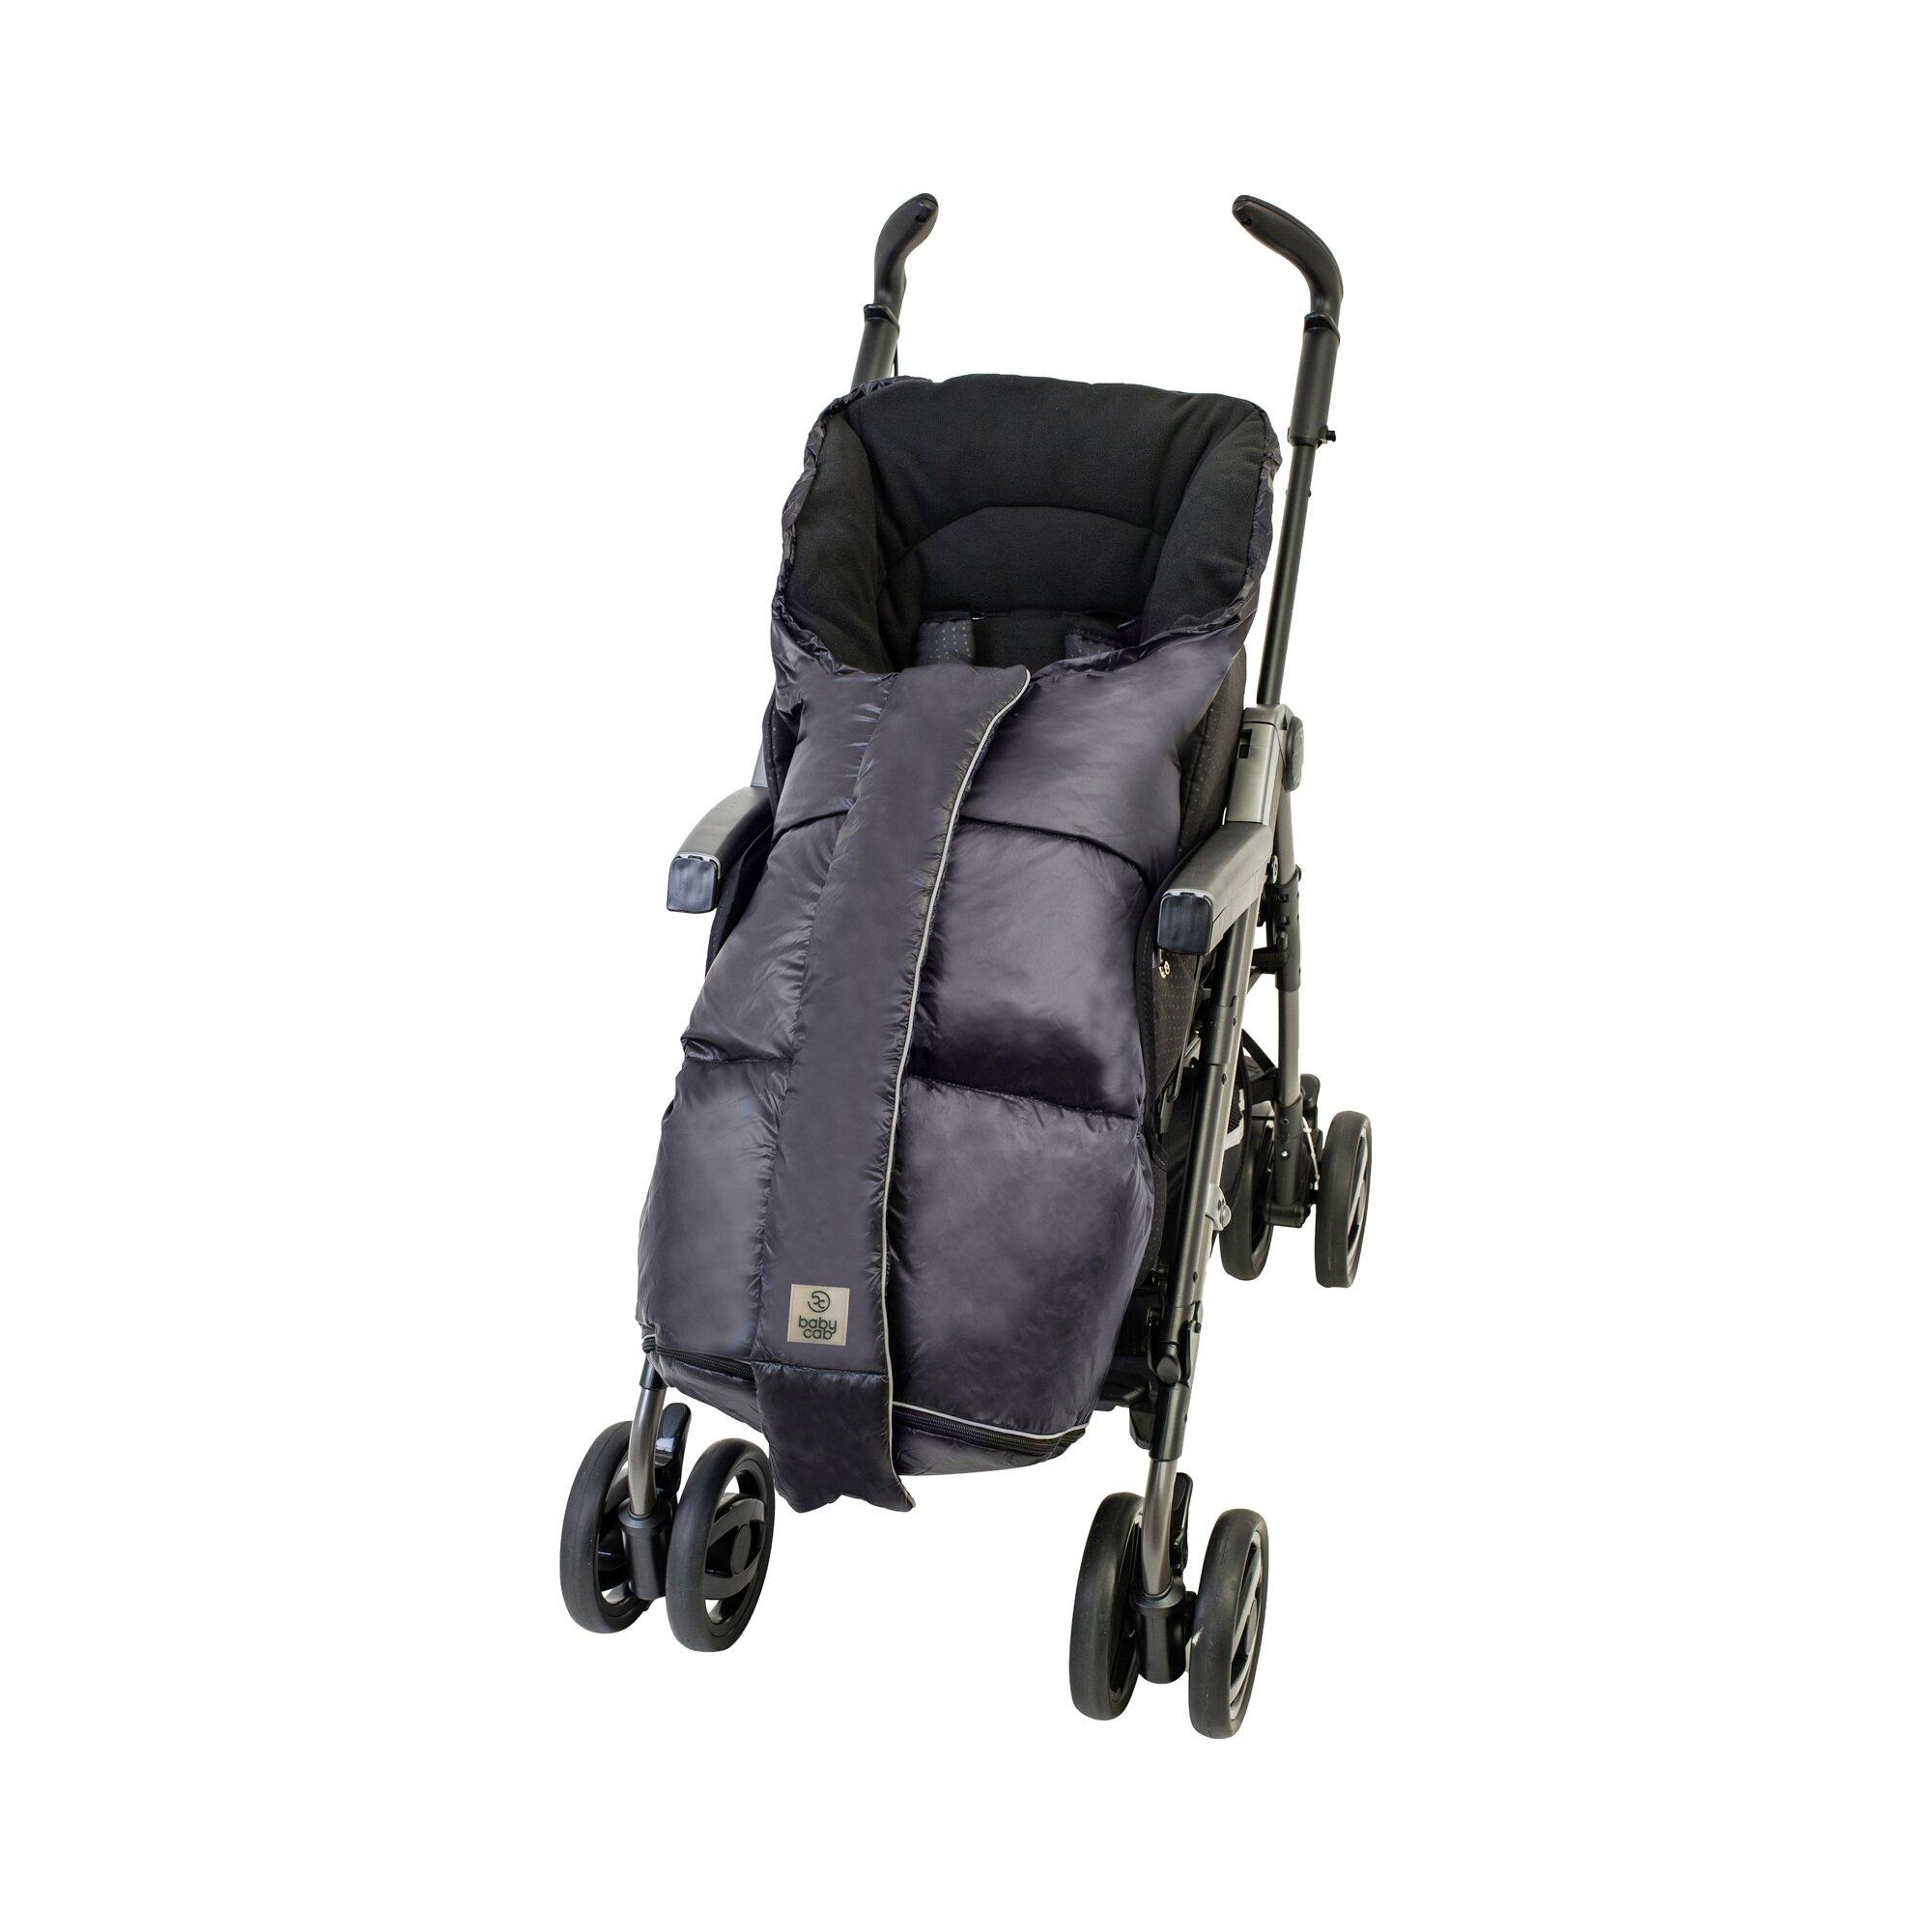 babycab-daunen-fu-sack-snag-fur-kinderwagen-buggy-schwarz